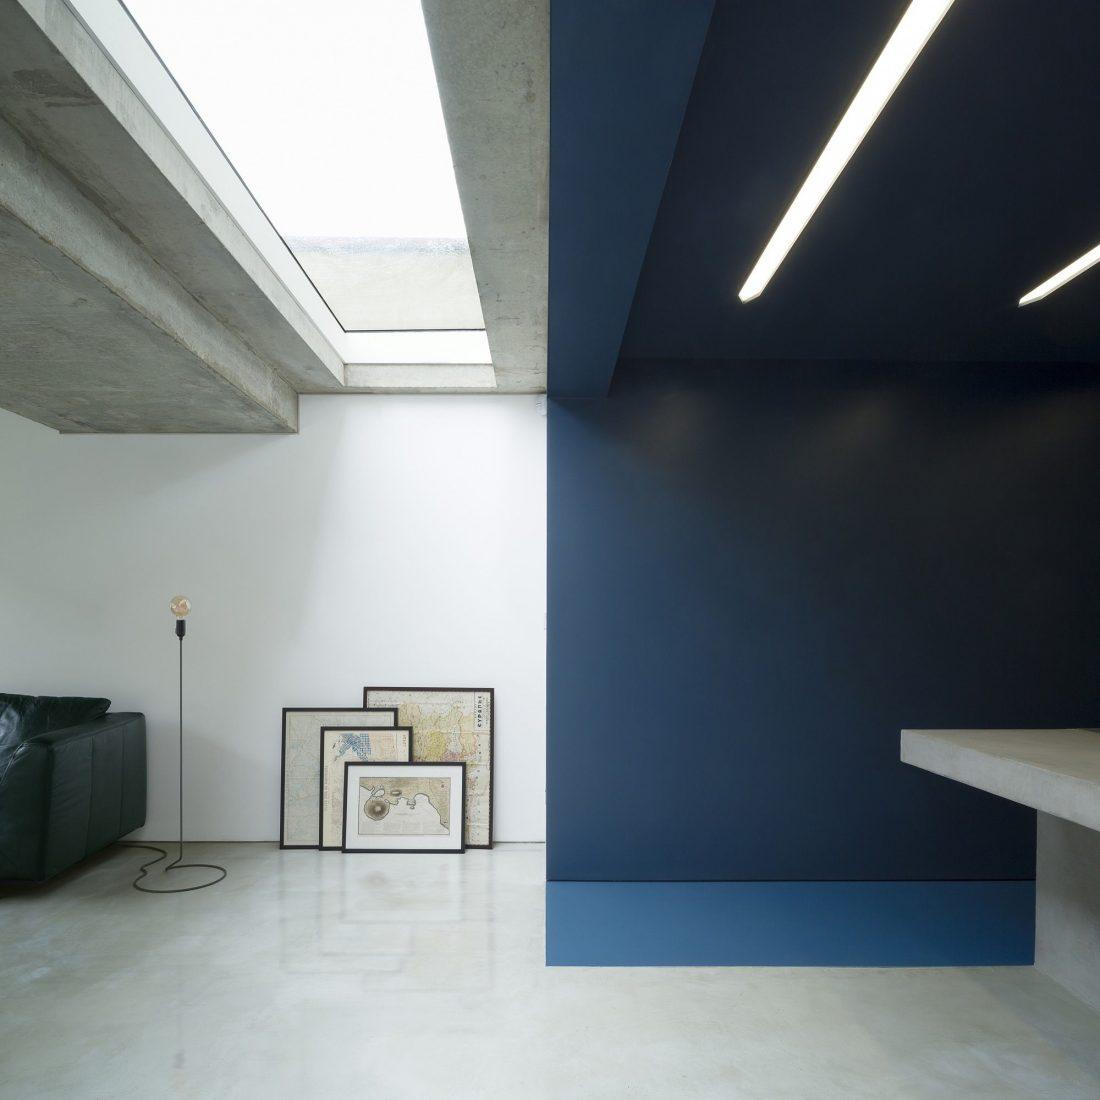 dinamika-i-obem-v-predelah-50-metrov-proekt-bureau-de-change-architects-1